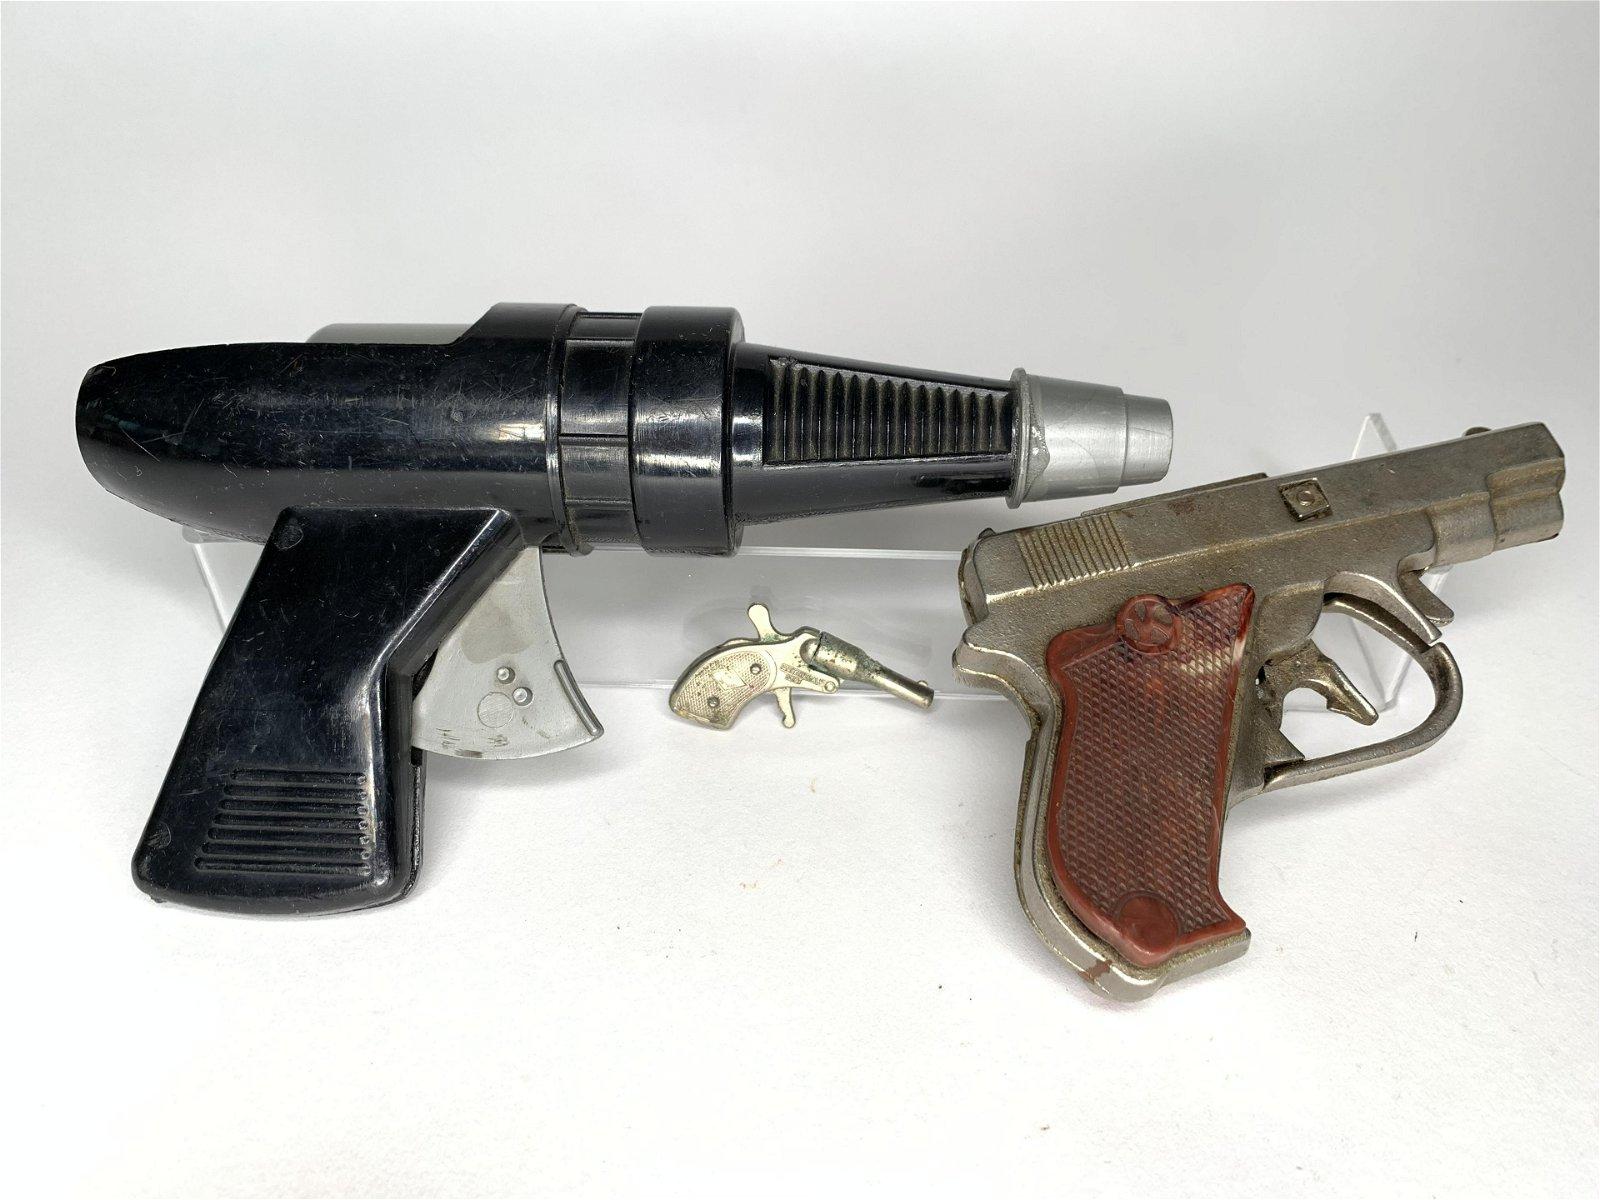 Assortment of Cap Guns